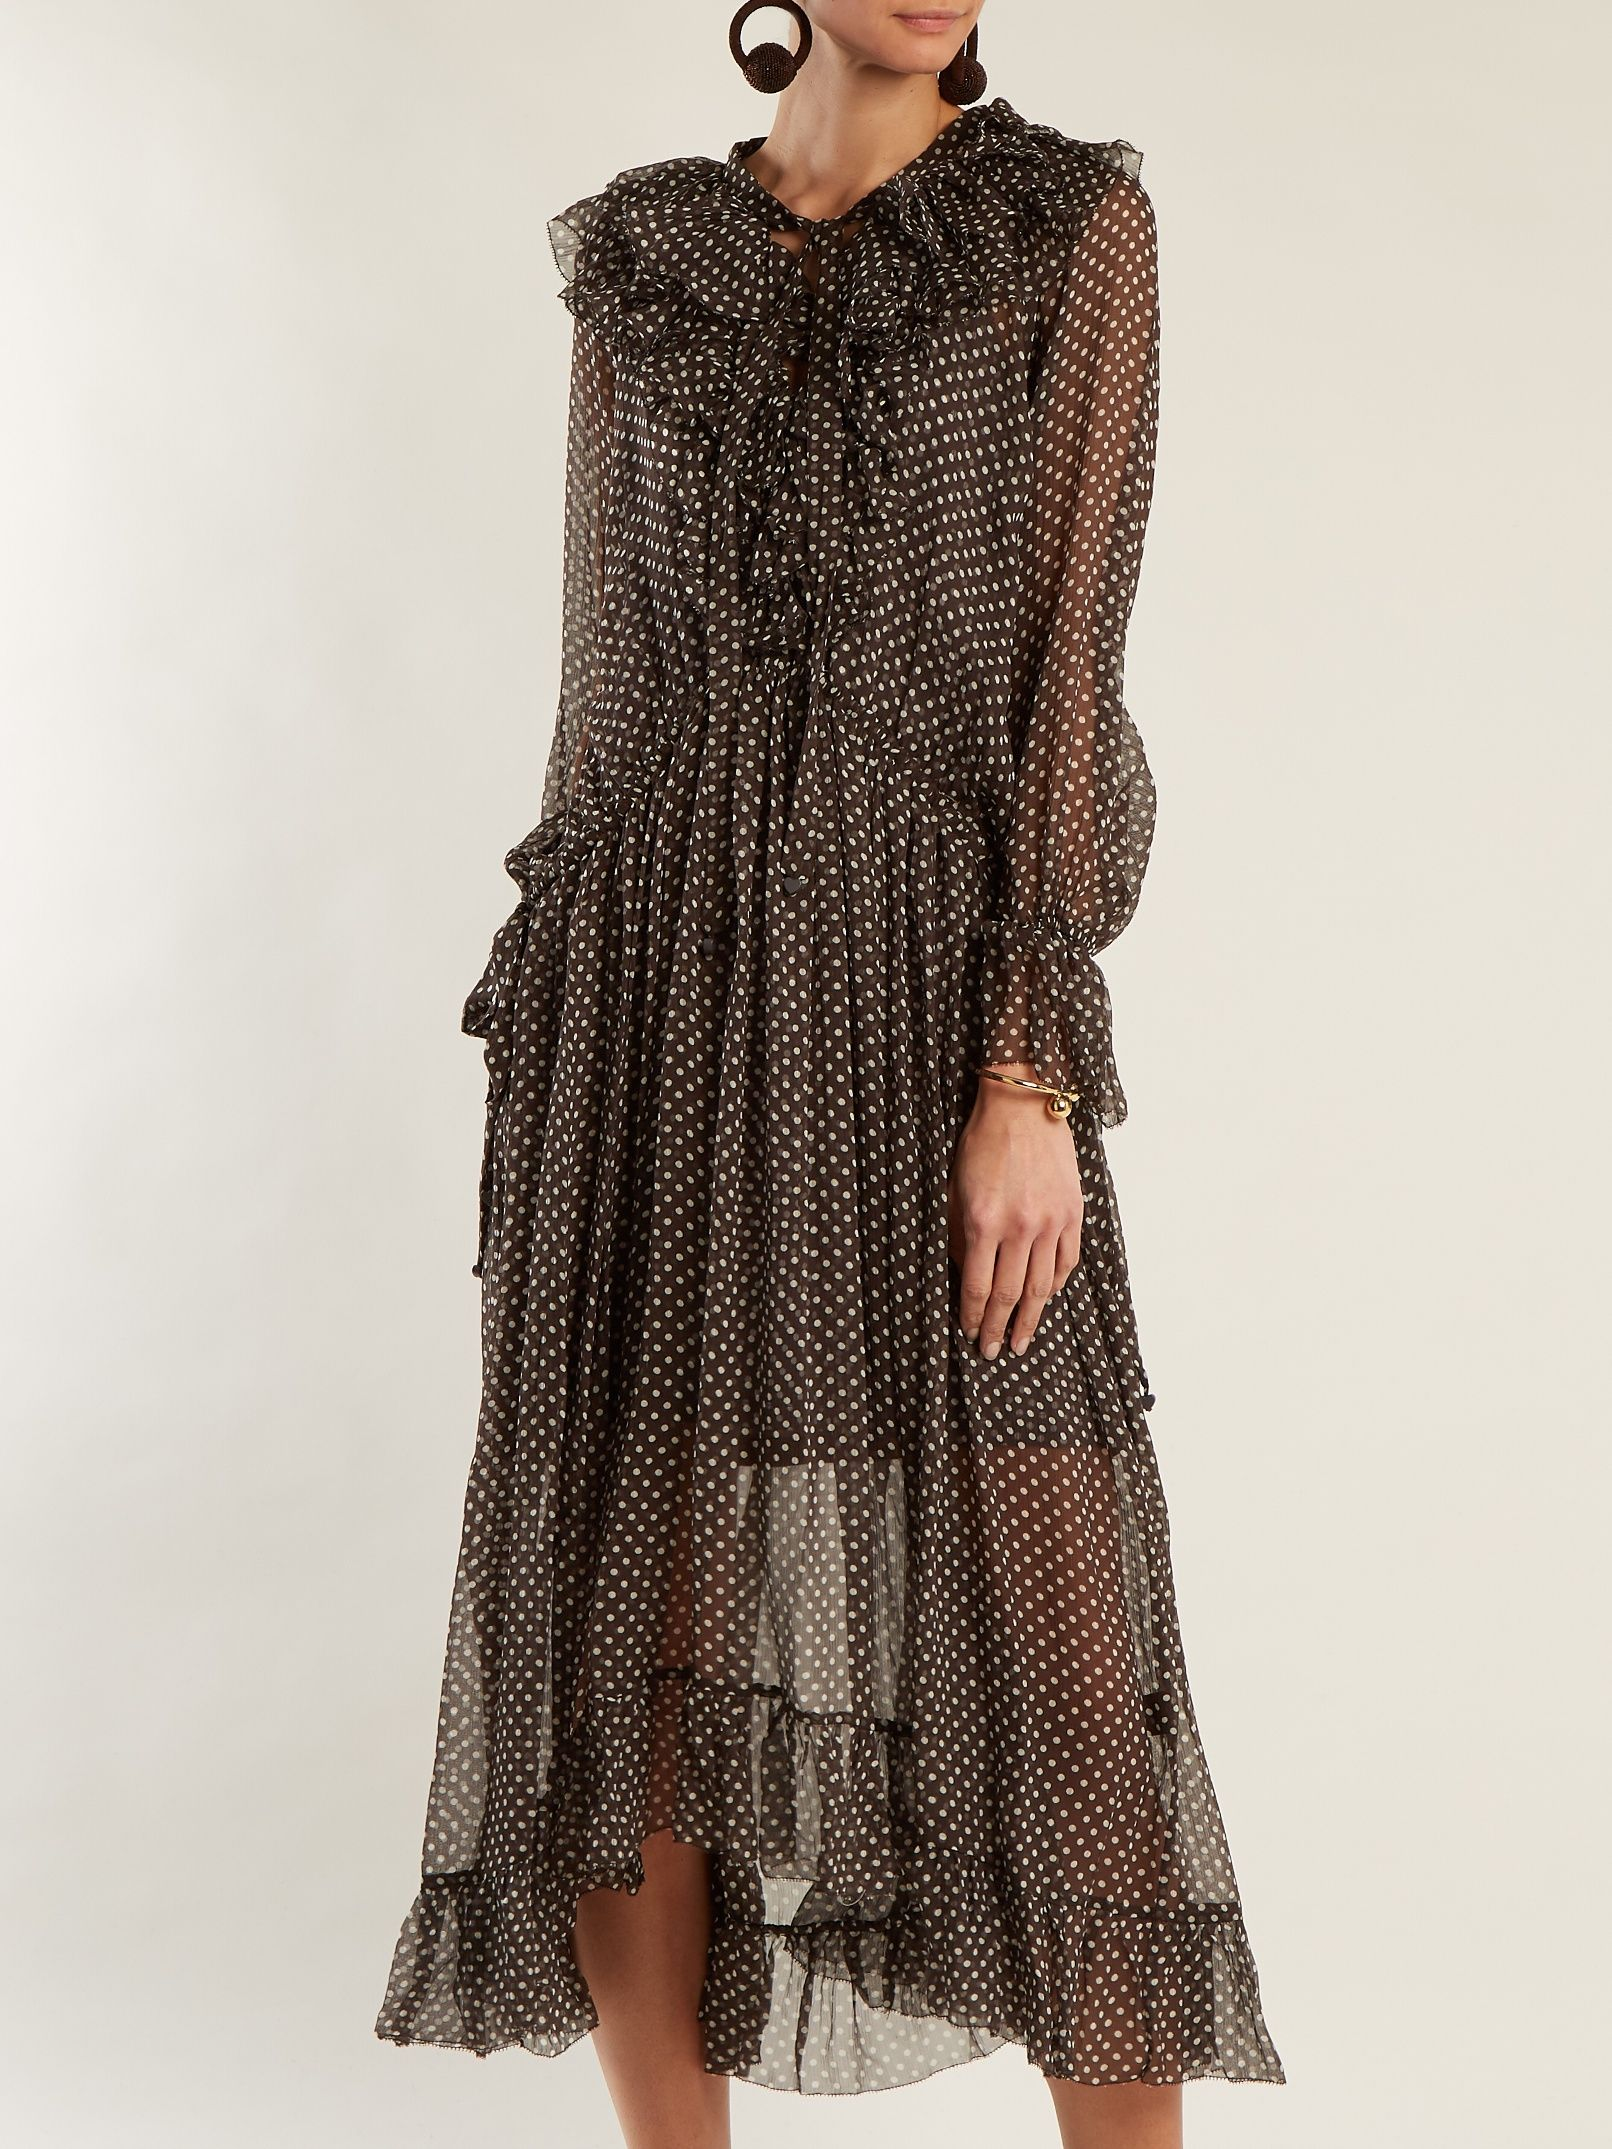 Painted Heart Ruffle polka dot-print silk dress Zimmermann Znq8vYH